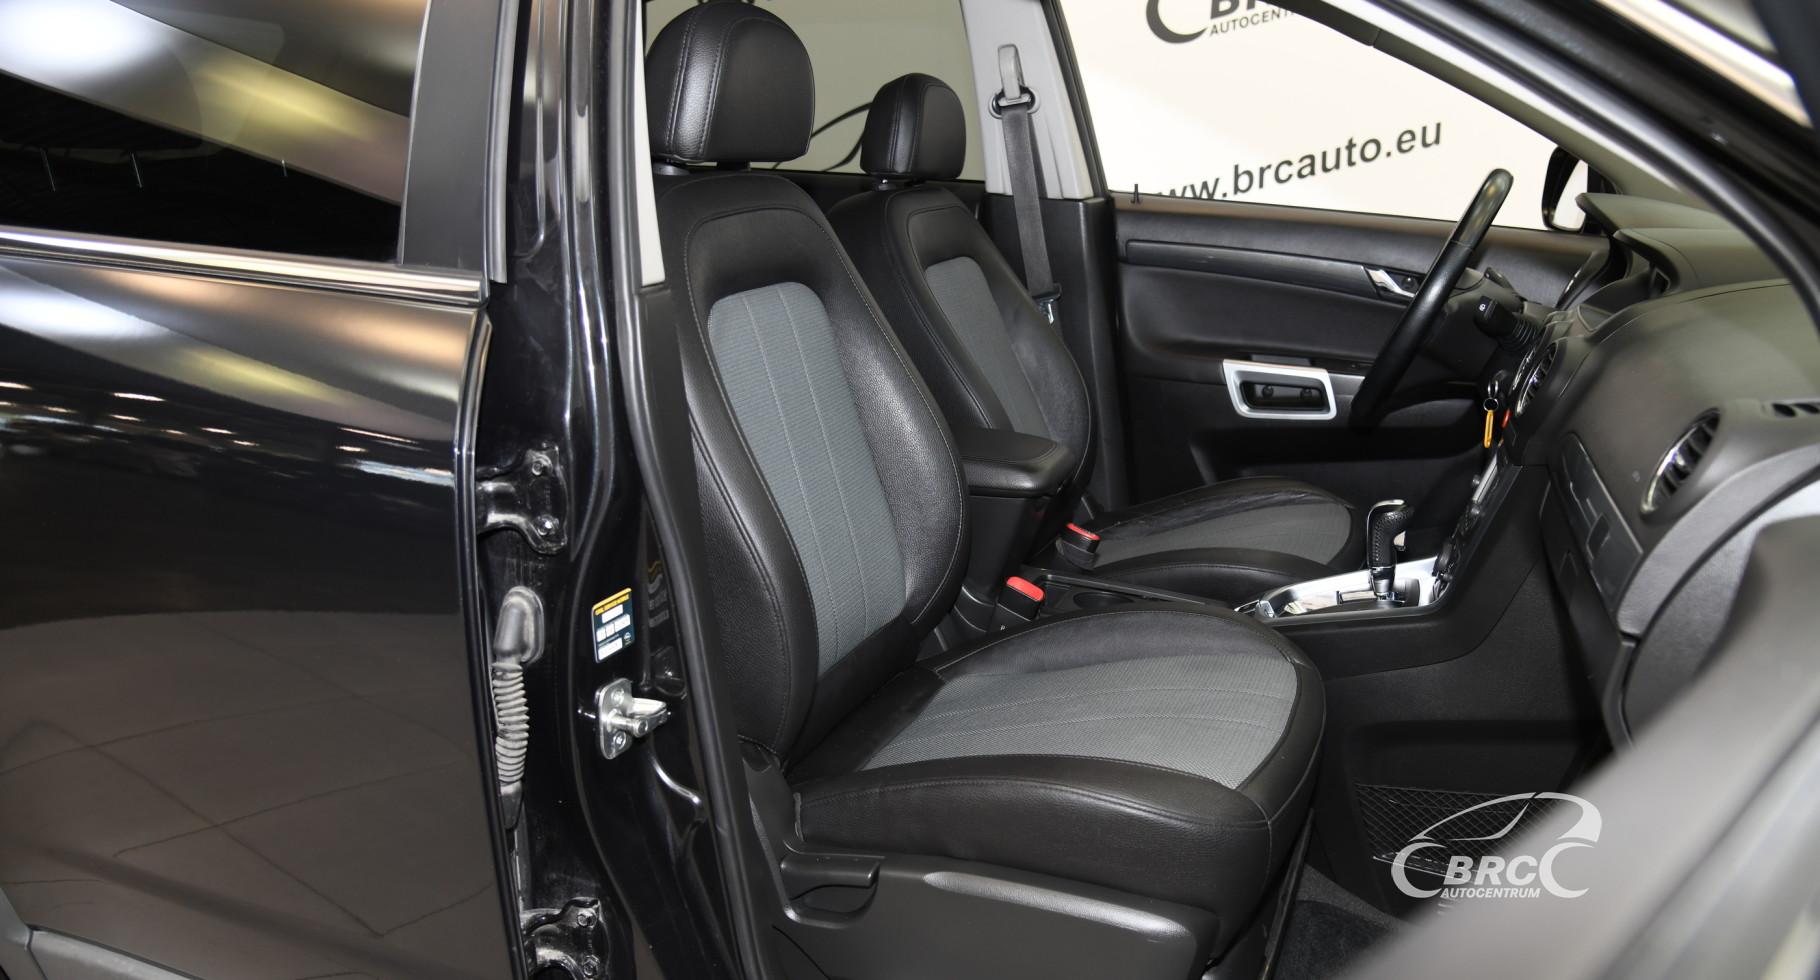 Opel Antara 2.4i 4x4 Enjoy Automatas